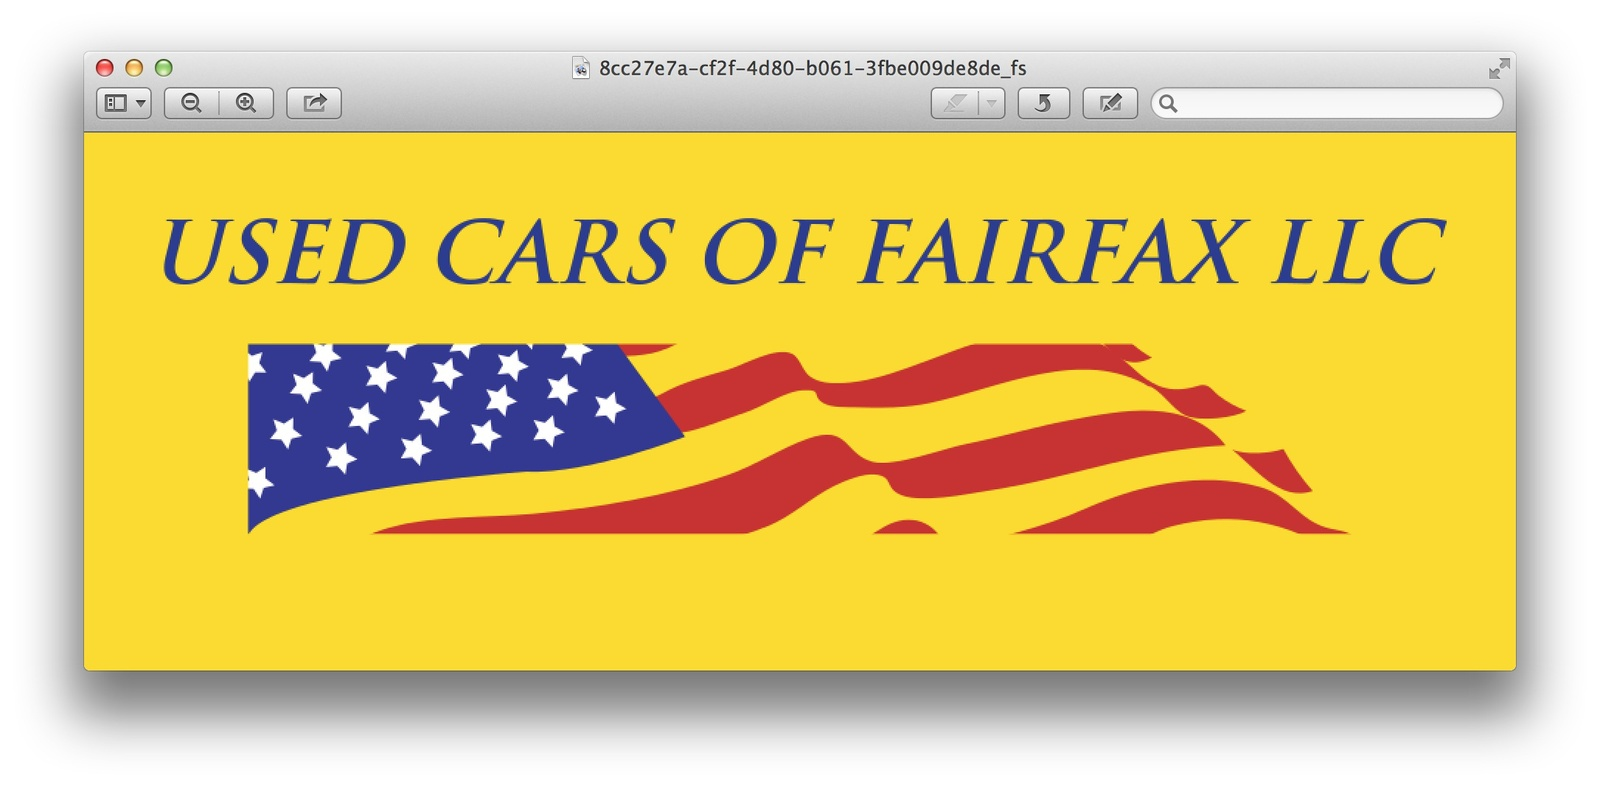 Hyundai Dealers In Va >> Used Cars of Fairfax LLC - Woodbridge, VA: Read Consumer ...